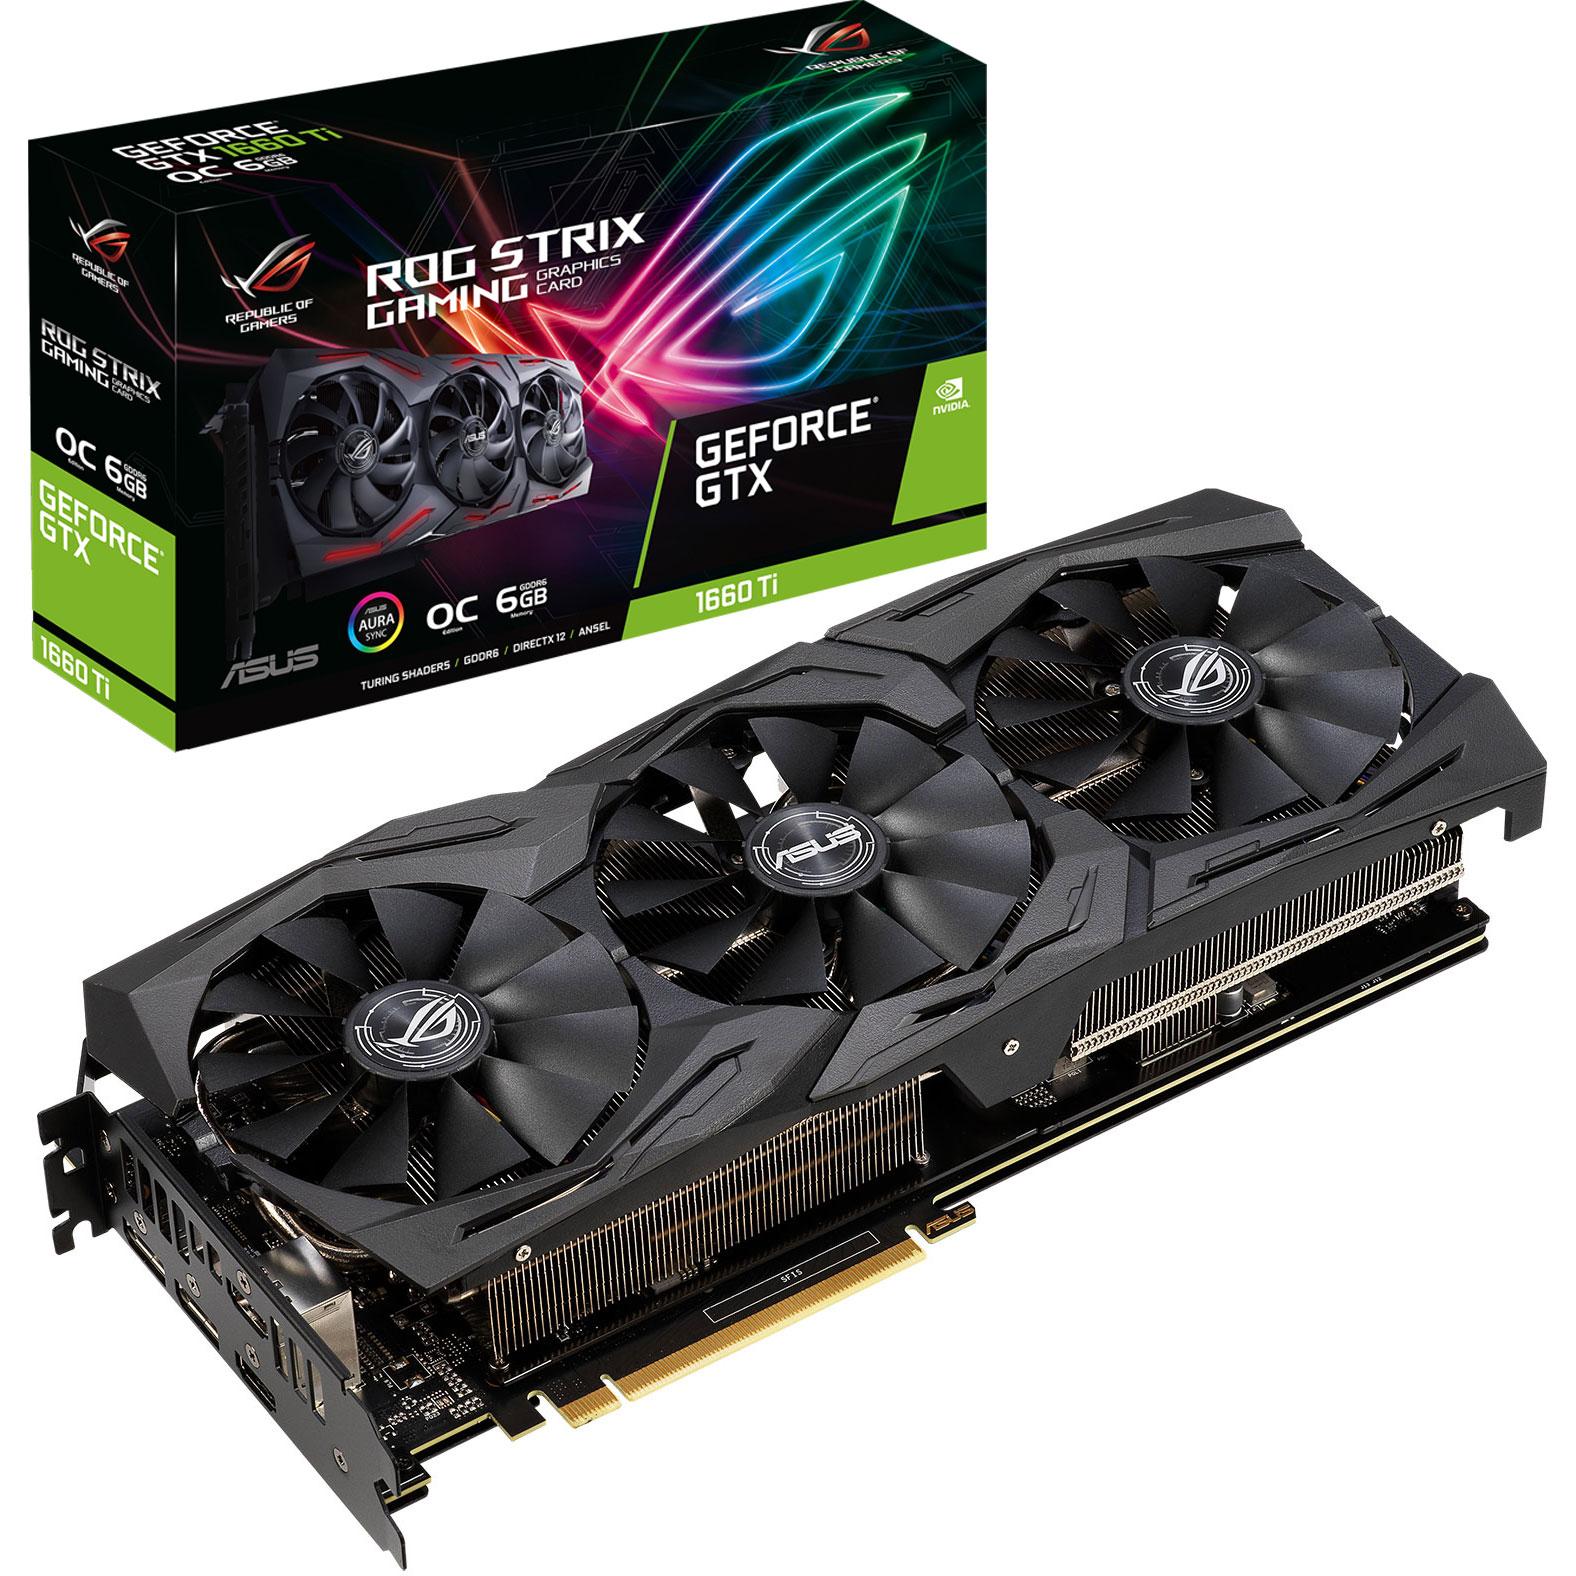 Carte graphique ASUS GeForce GTX 1660 Ti ROG-STRIX-GTX1660TI-O6G-GAMING 6 Go GDDR6 - Dual HDMI/Dual DisplayPort - PCI Express (NVIDIA GeForce GTX 1660 Ti)